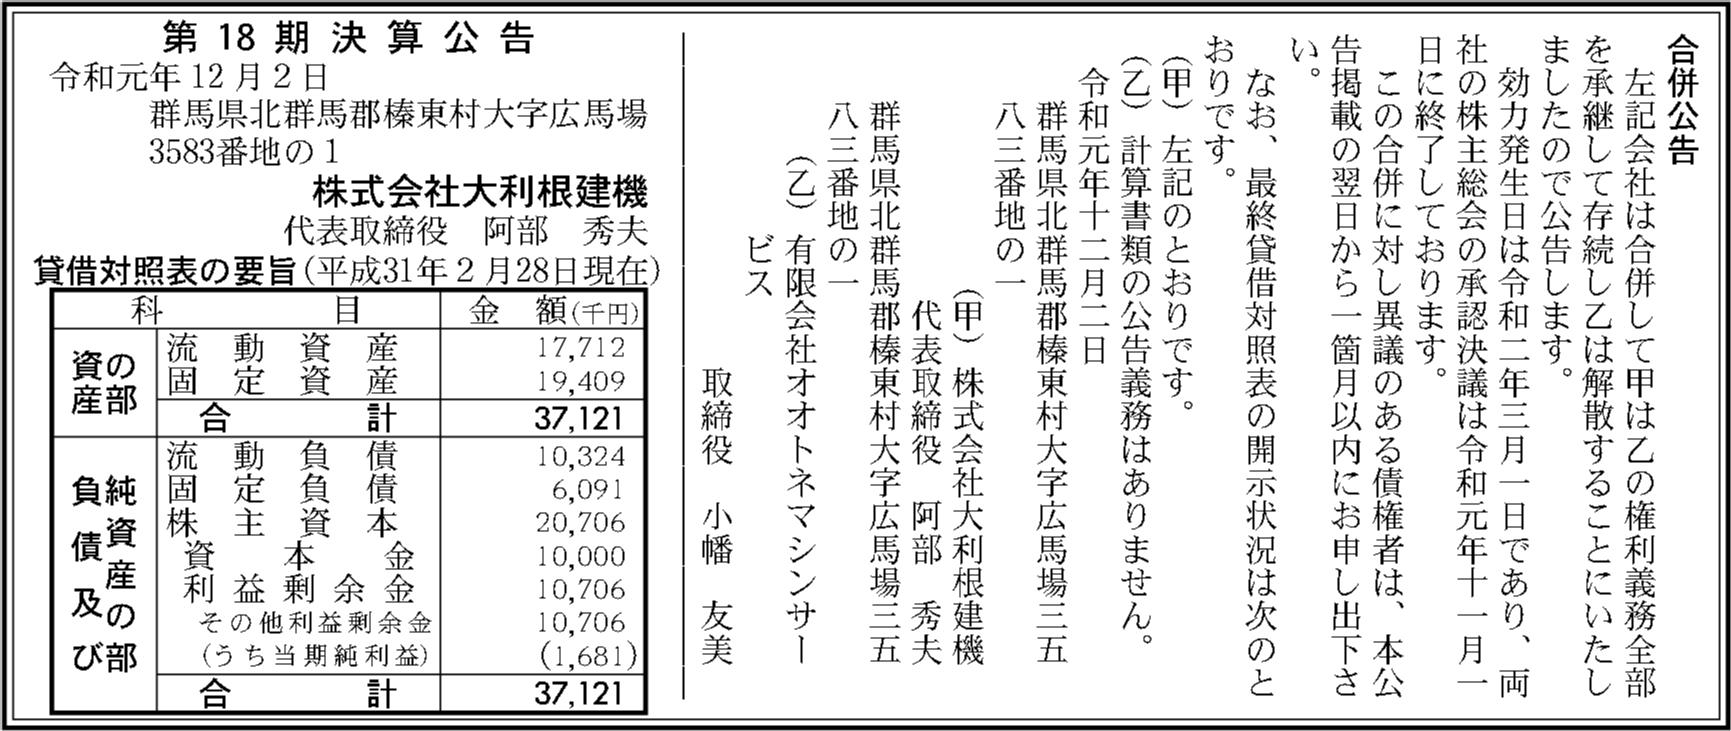 0063 f88129e6c25c0f56eee0b5c1fdcba03fc8cdfab92689a6c1167422530b80262be99e2c02c97d38dfe6f5f3dc5077715b94a246080fd50c4f58ce247c8a7876e7 09